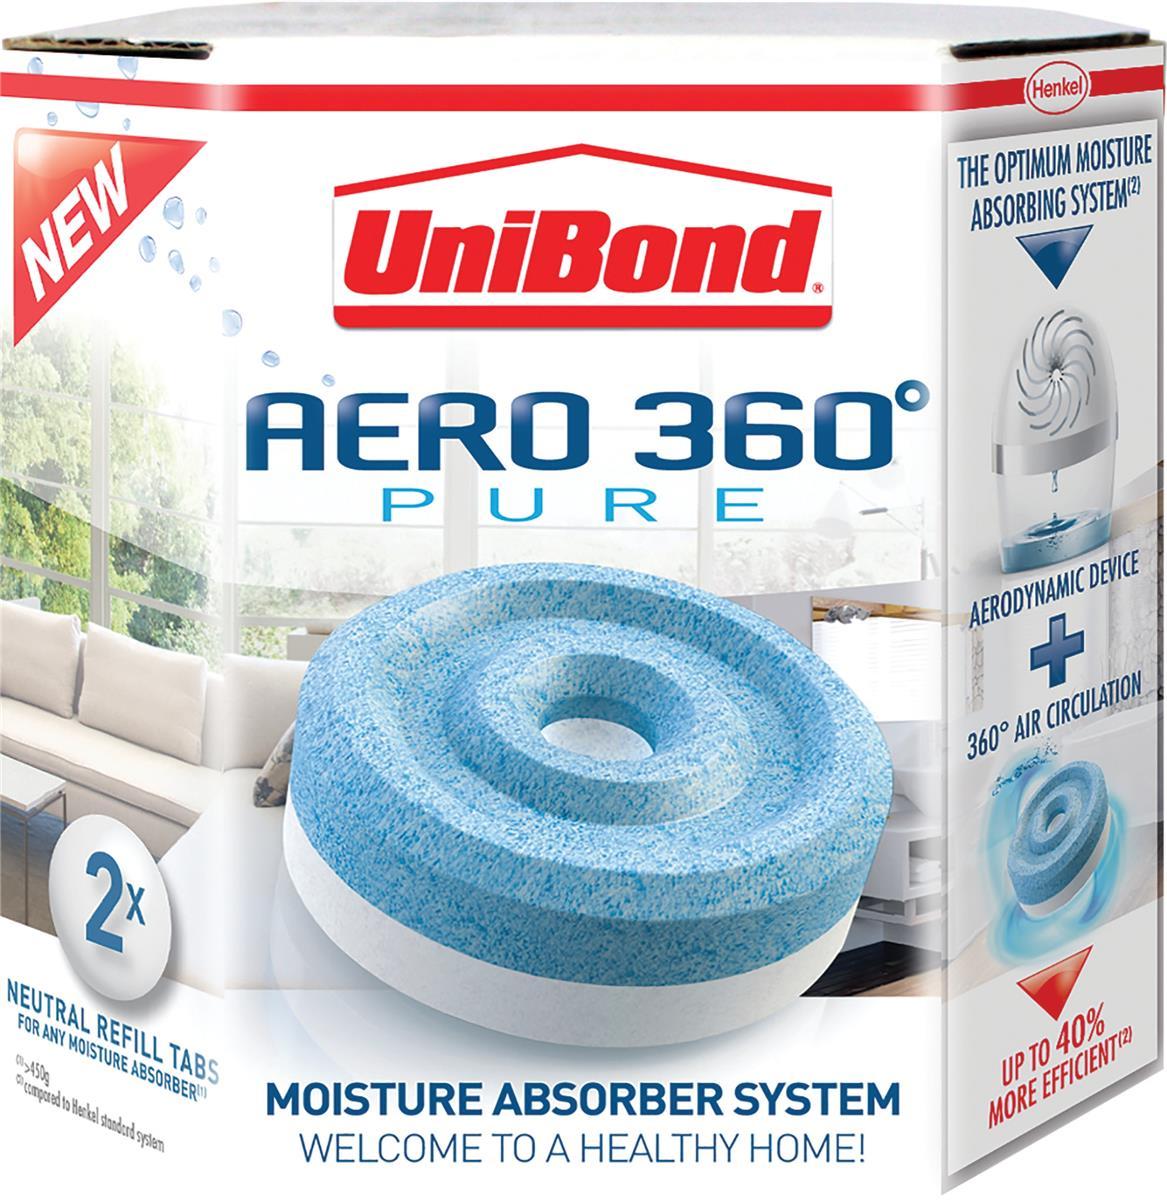 Image for UniBond Aero 360 Moisture Absorber Refill Pure Ref 2106199 [Pack 4]